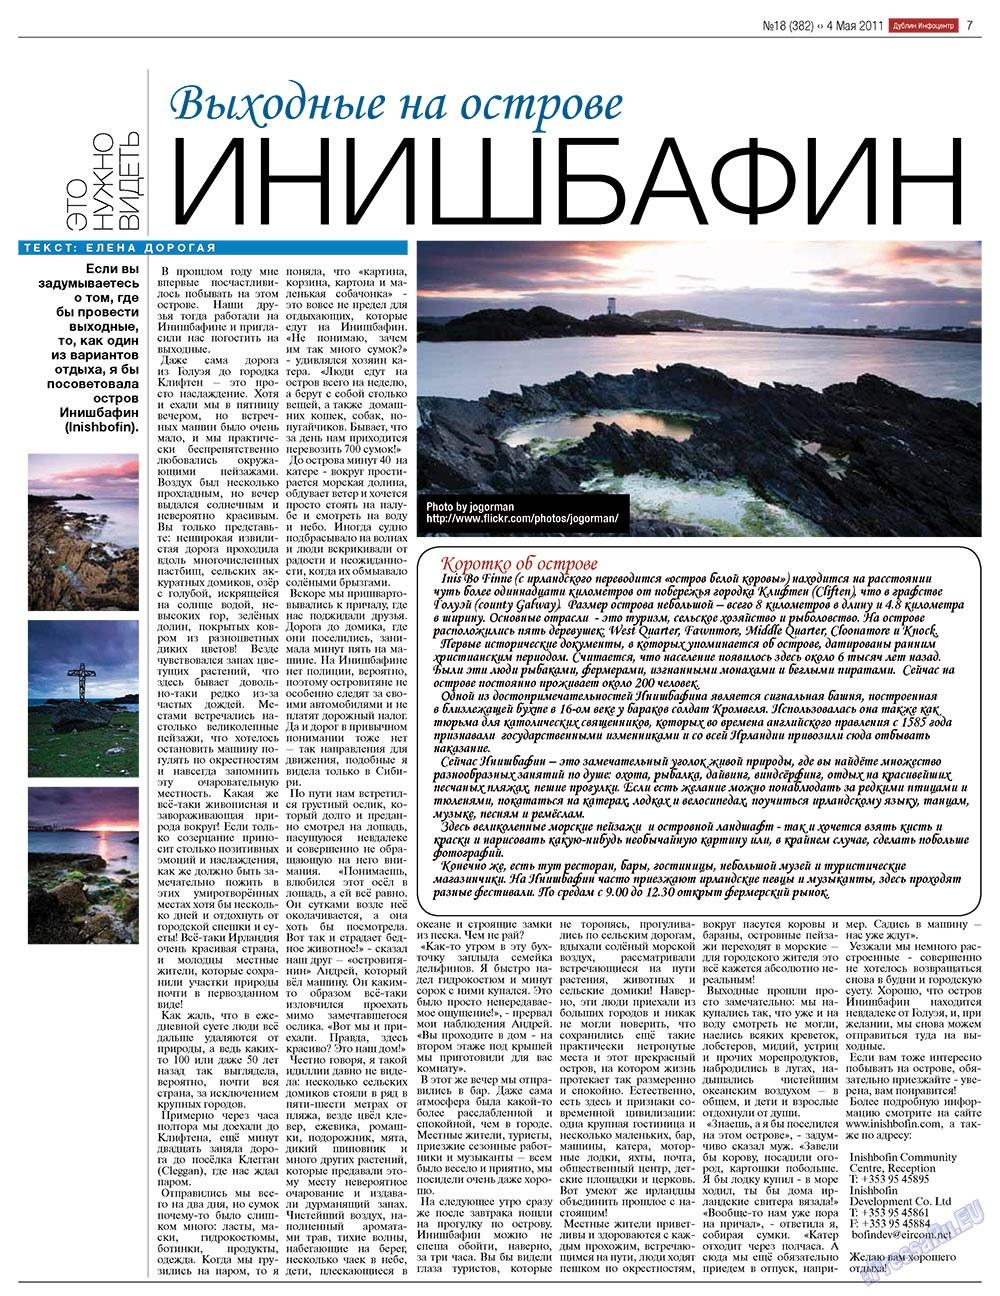 Дублин инфоцентр (газета). 2011 год, номер 18, стр. 7